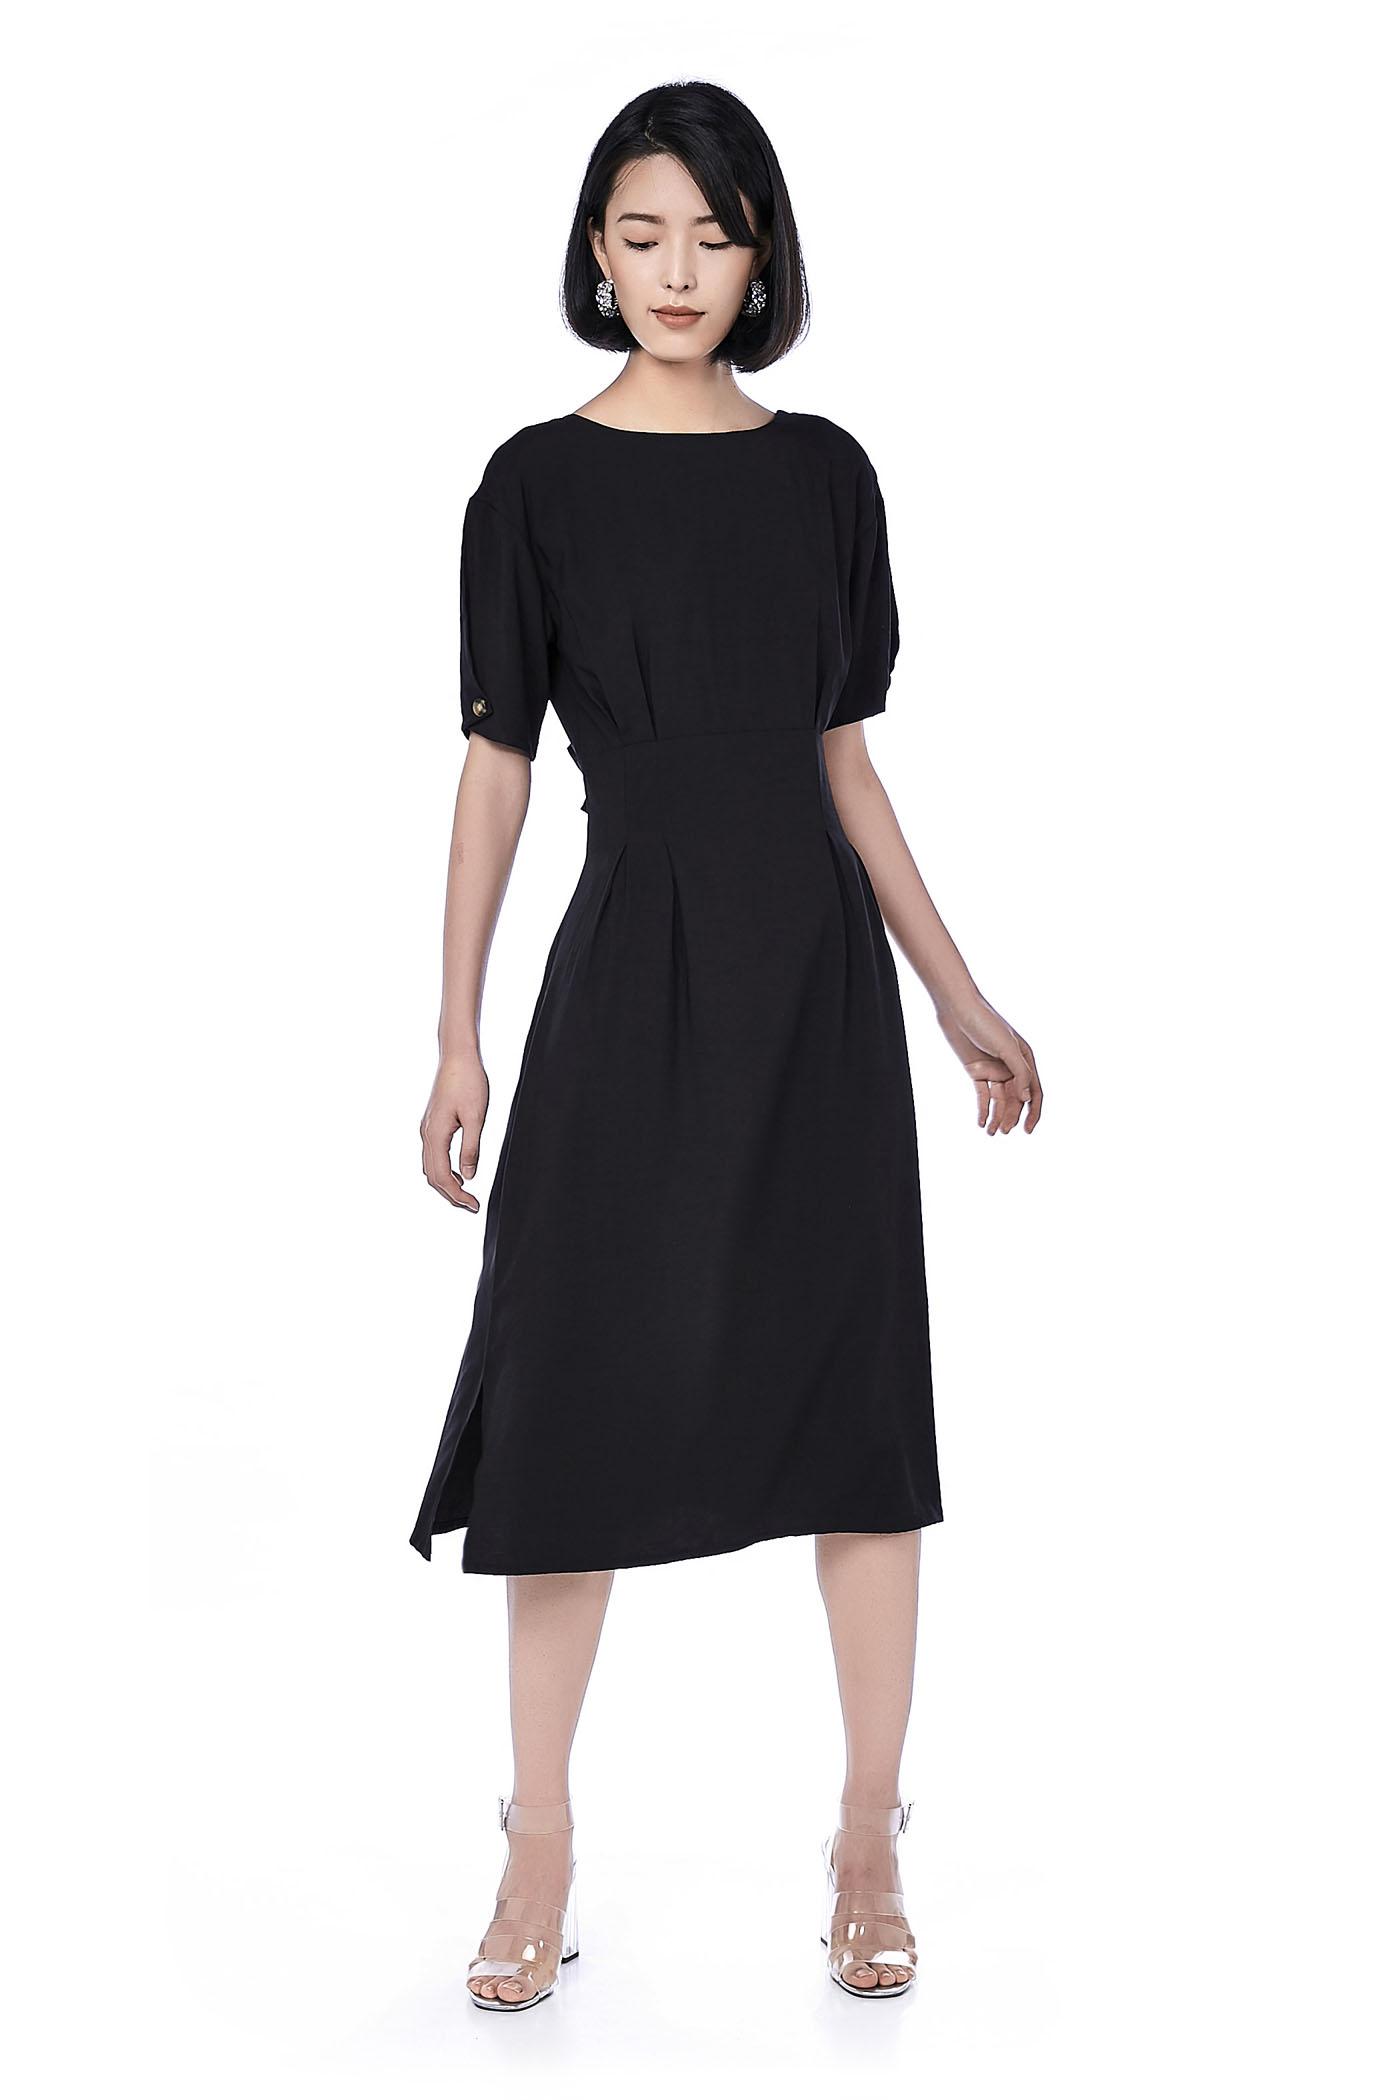 Mell Low Back Dress